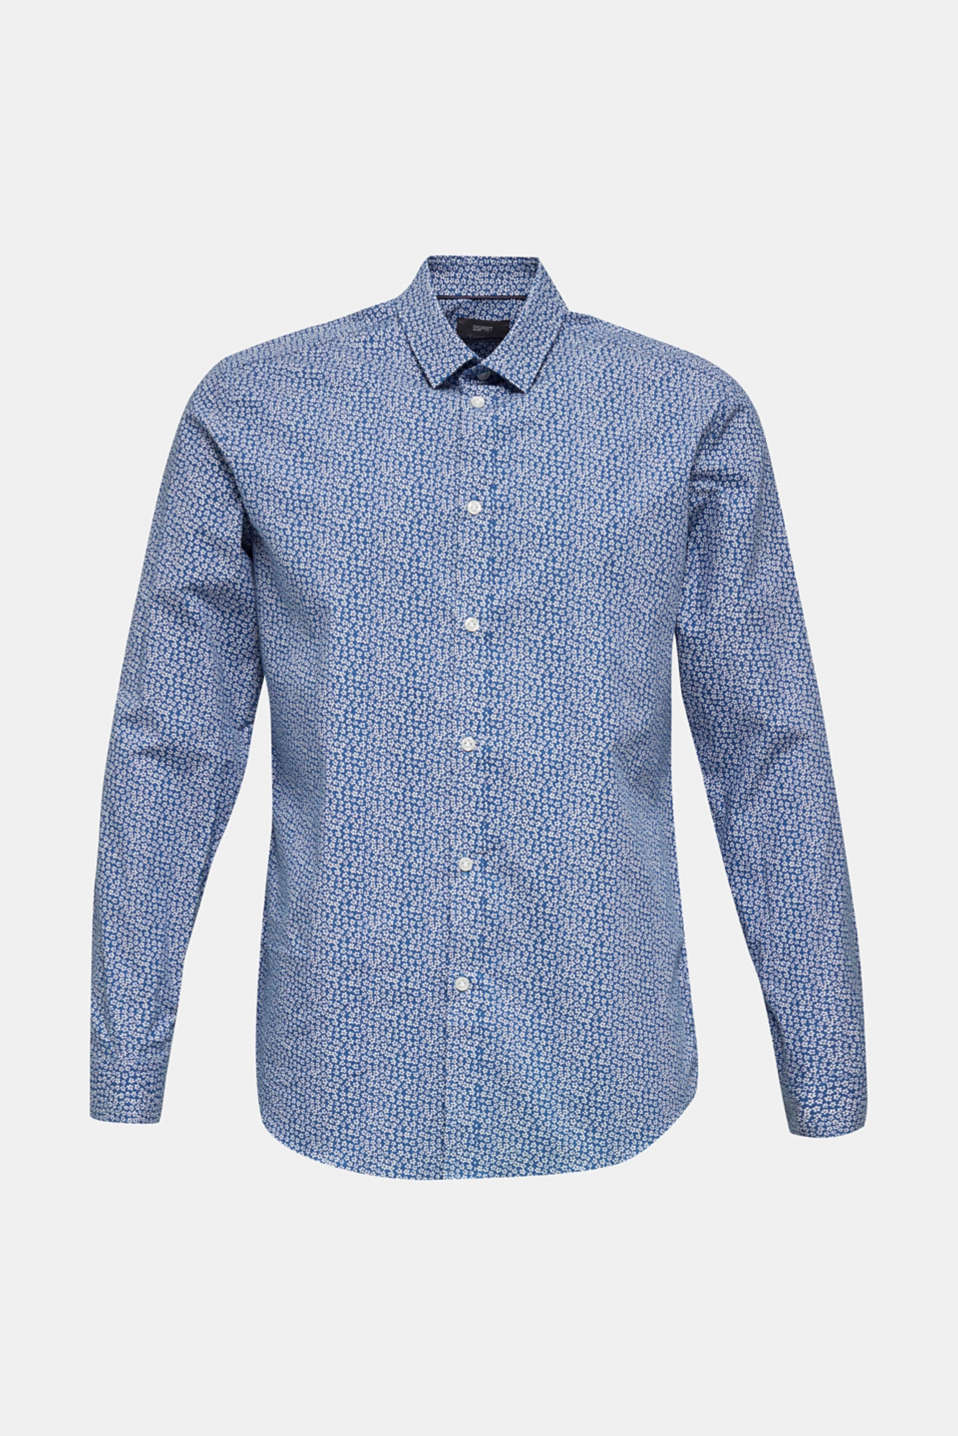 Floral shirt made of 100% cotton, DARK BLUE 5, detail image number 6